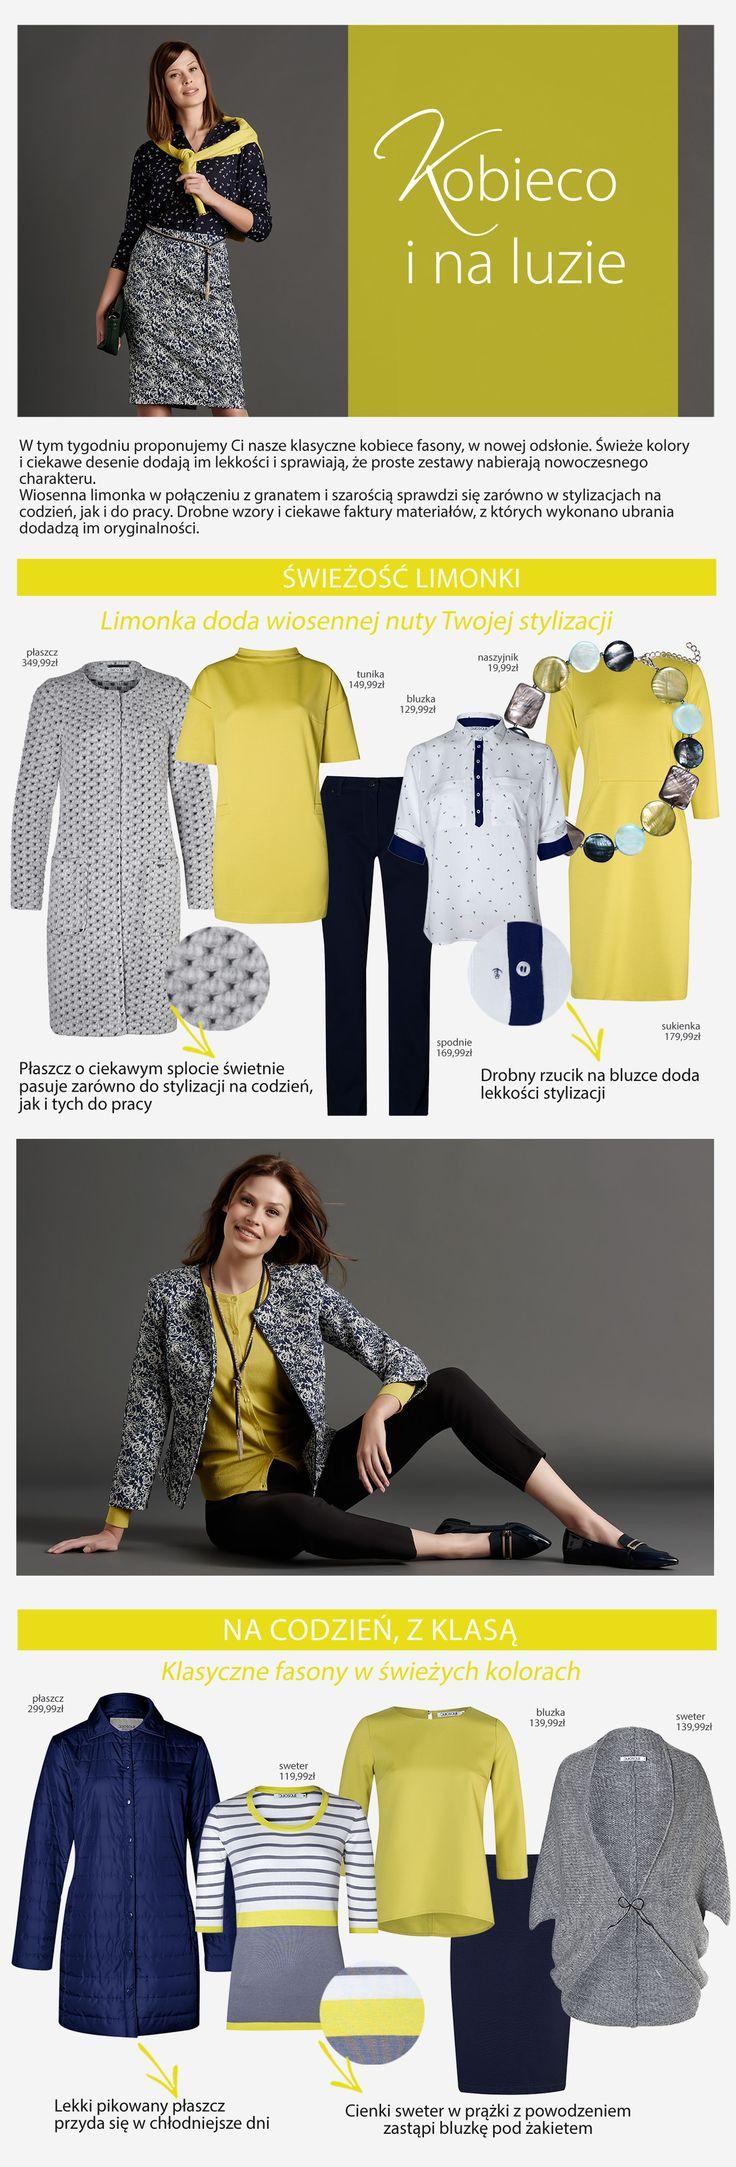 #quiosquepl #quiosque #naszeinspiracje #poniedzialek #monday #new #collection #lady #style #outfit #dress #blouse #trousers #feminine #kobieco #womanwear #trends #inspirations #autumn #winter